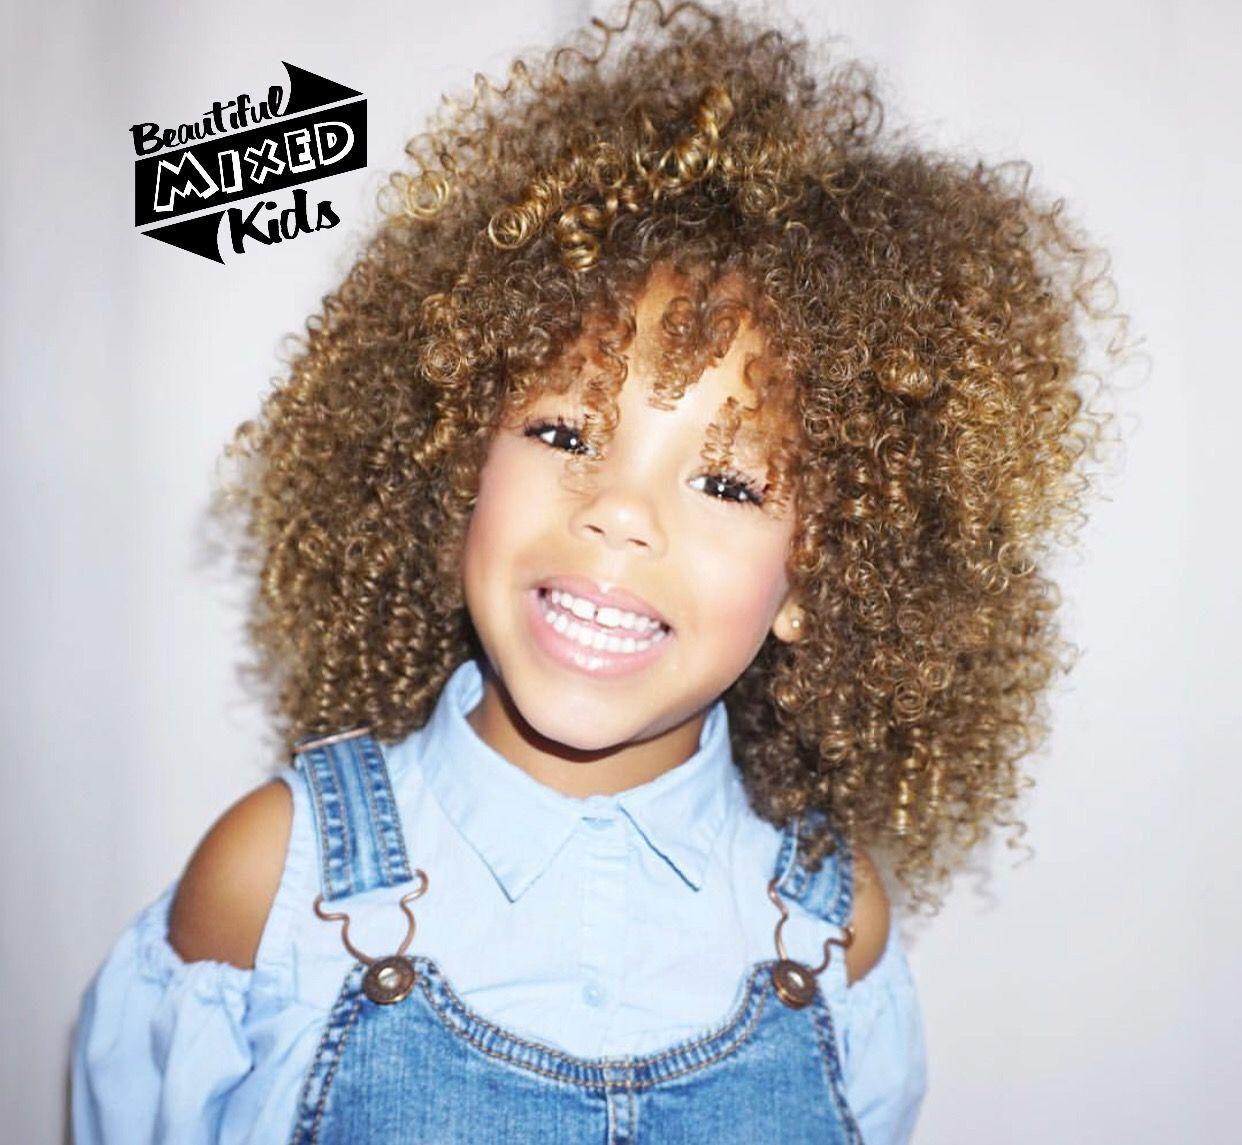 Olivia 3 Years Jamaican Scandinavian Follow Beautifulmixedkids Http Instagram Com Beautifulmixedkids Beautiful Children Mixed Kids Beauty